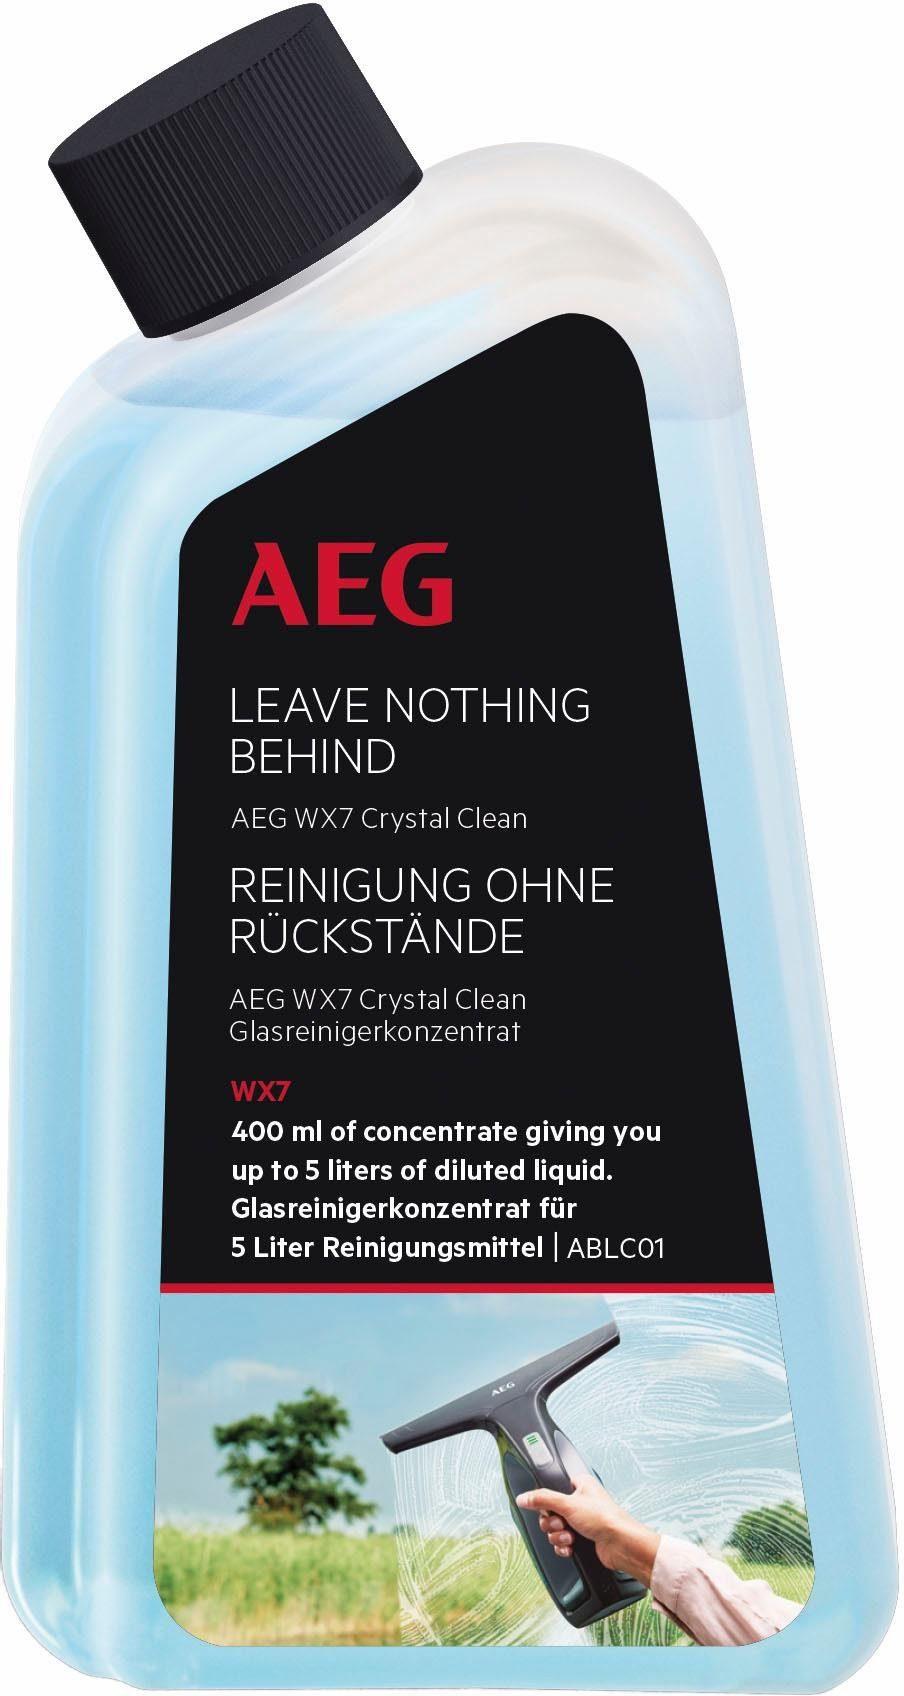 AEG Glasreinigerkonzentrat AEG ABLC01 WX7